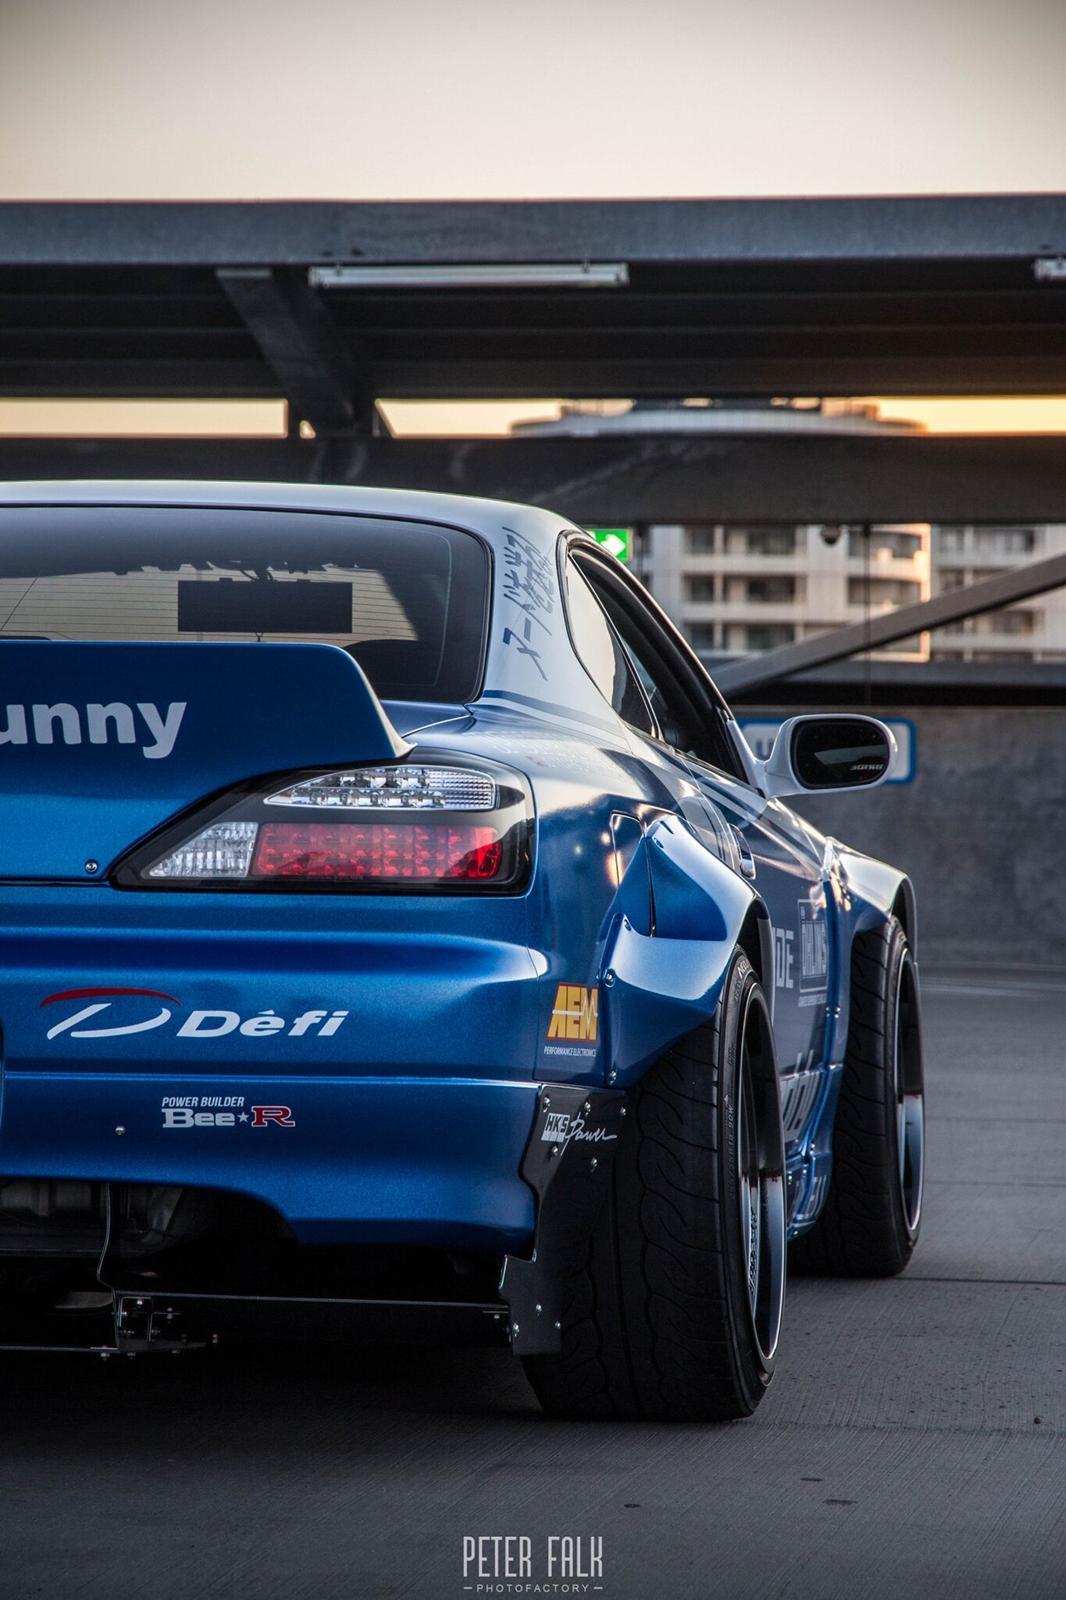 Nissan Silvia S15 Spec R Rocket Bunny V2 billede 22